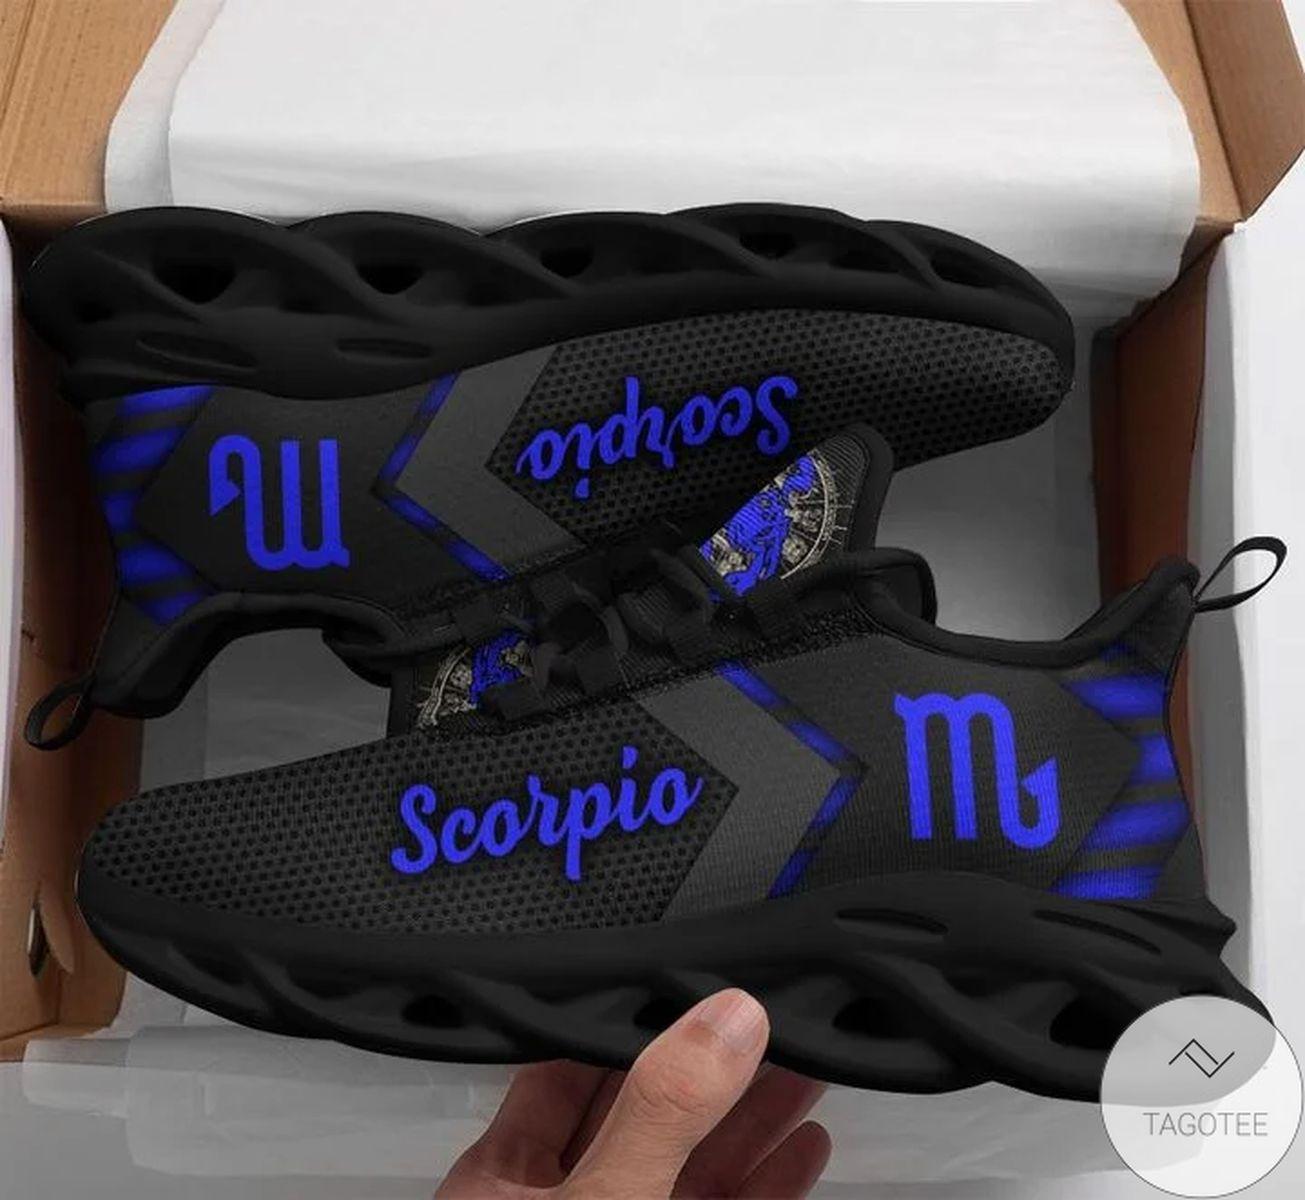 Scorpio Sneaker Max Soul Shoes